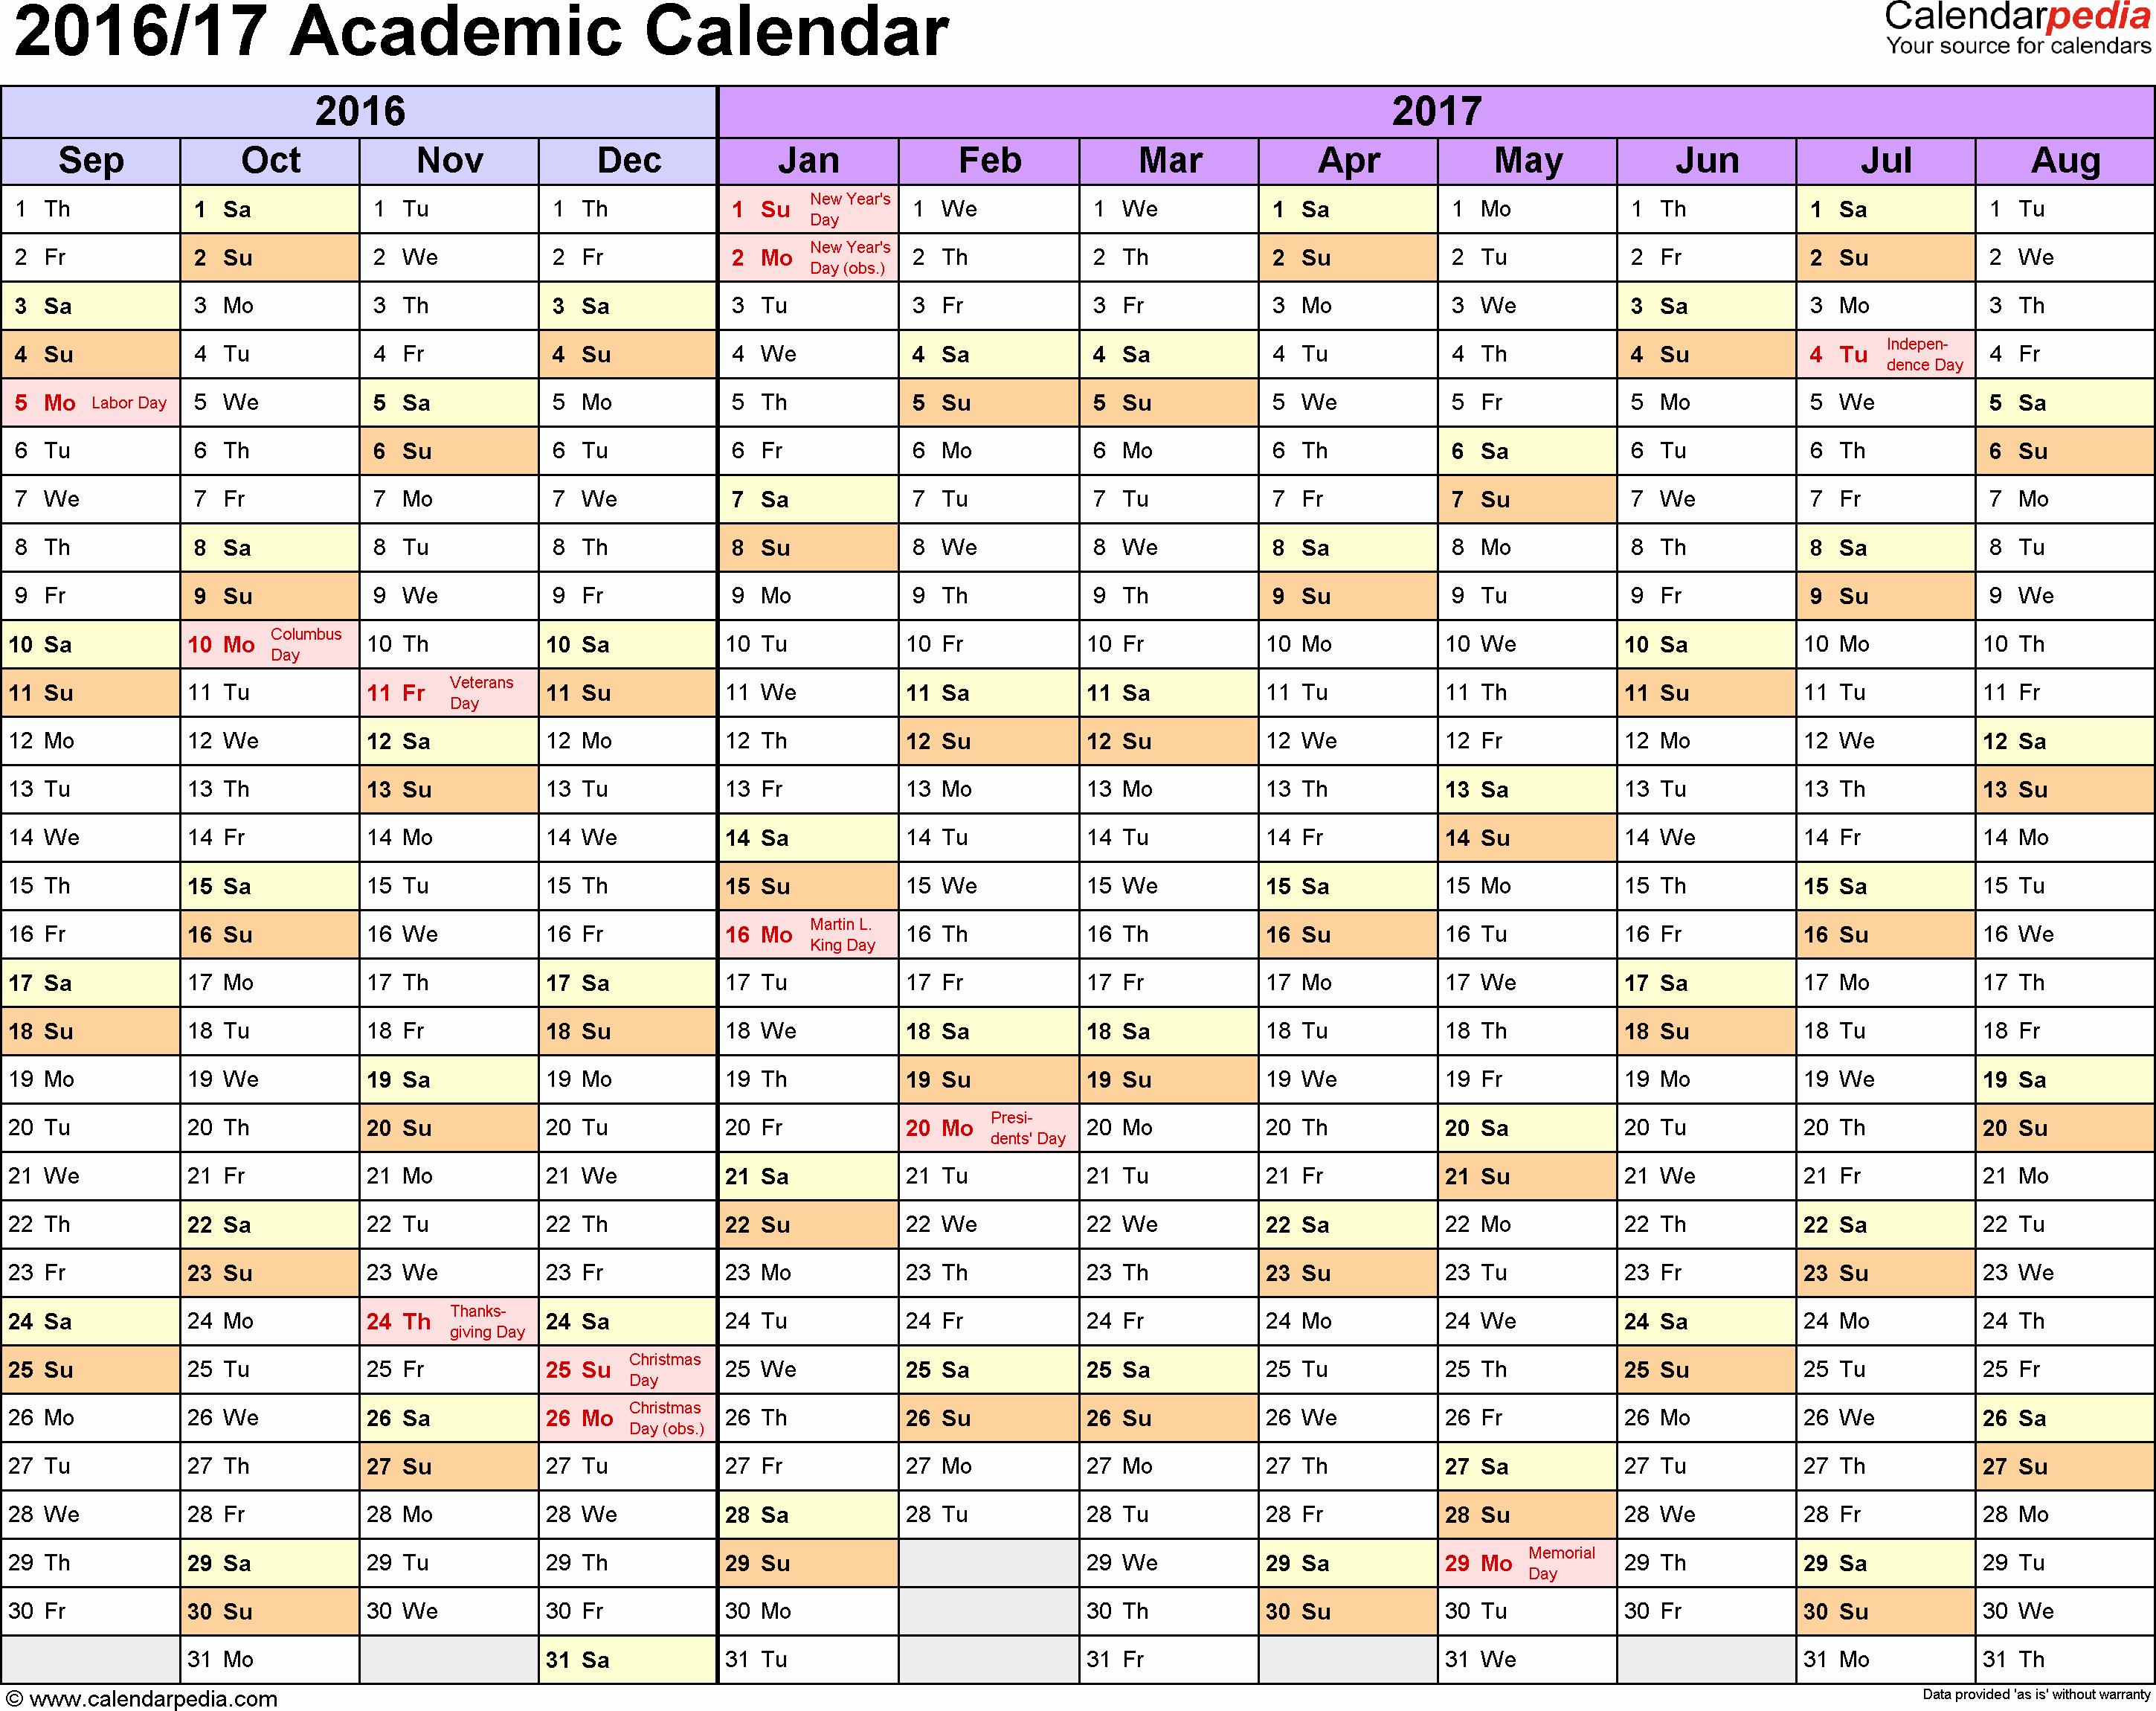 Blank Calendar 2016-17 Awesome Academic Calendars 2016 2017 Free Printable Excel Templates